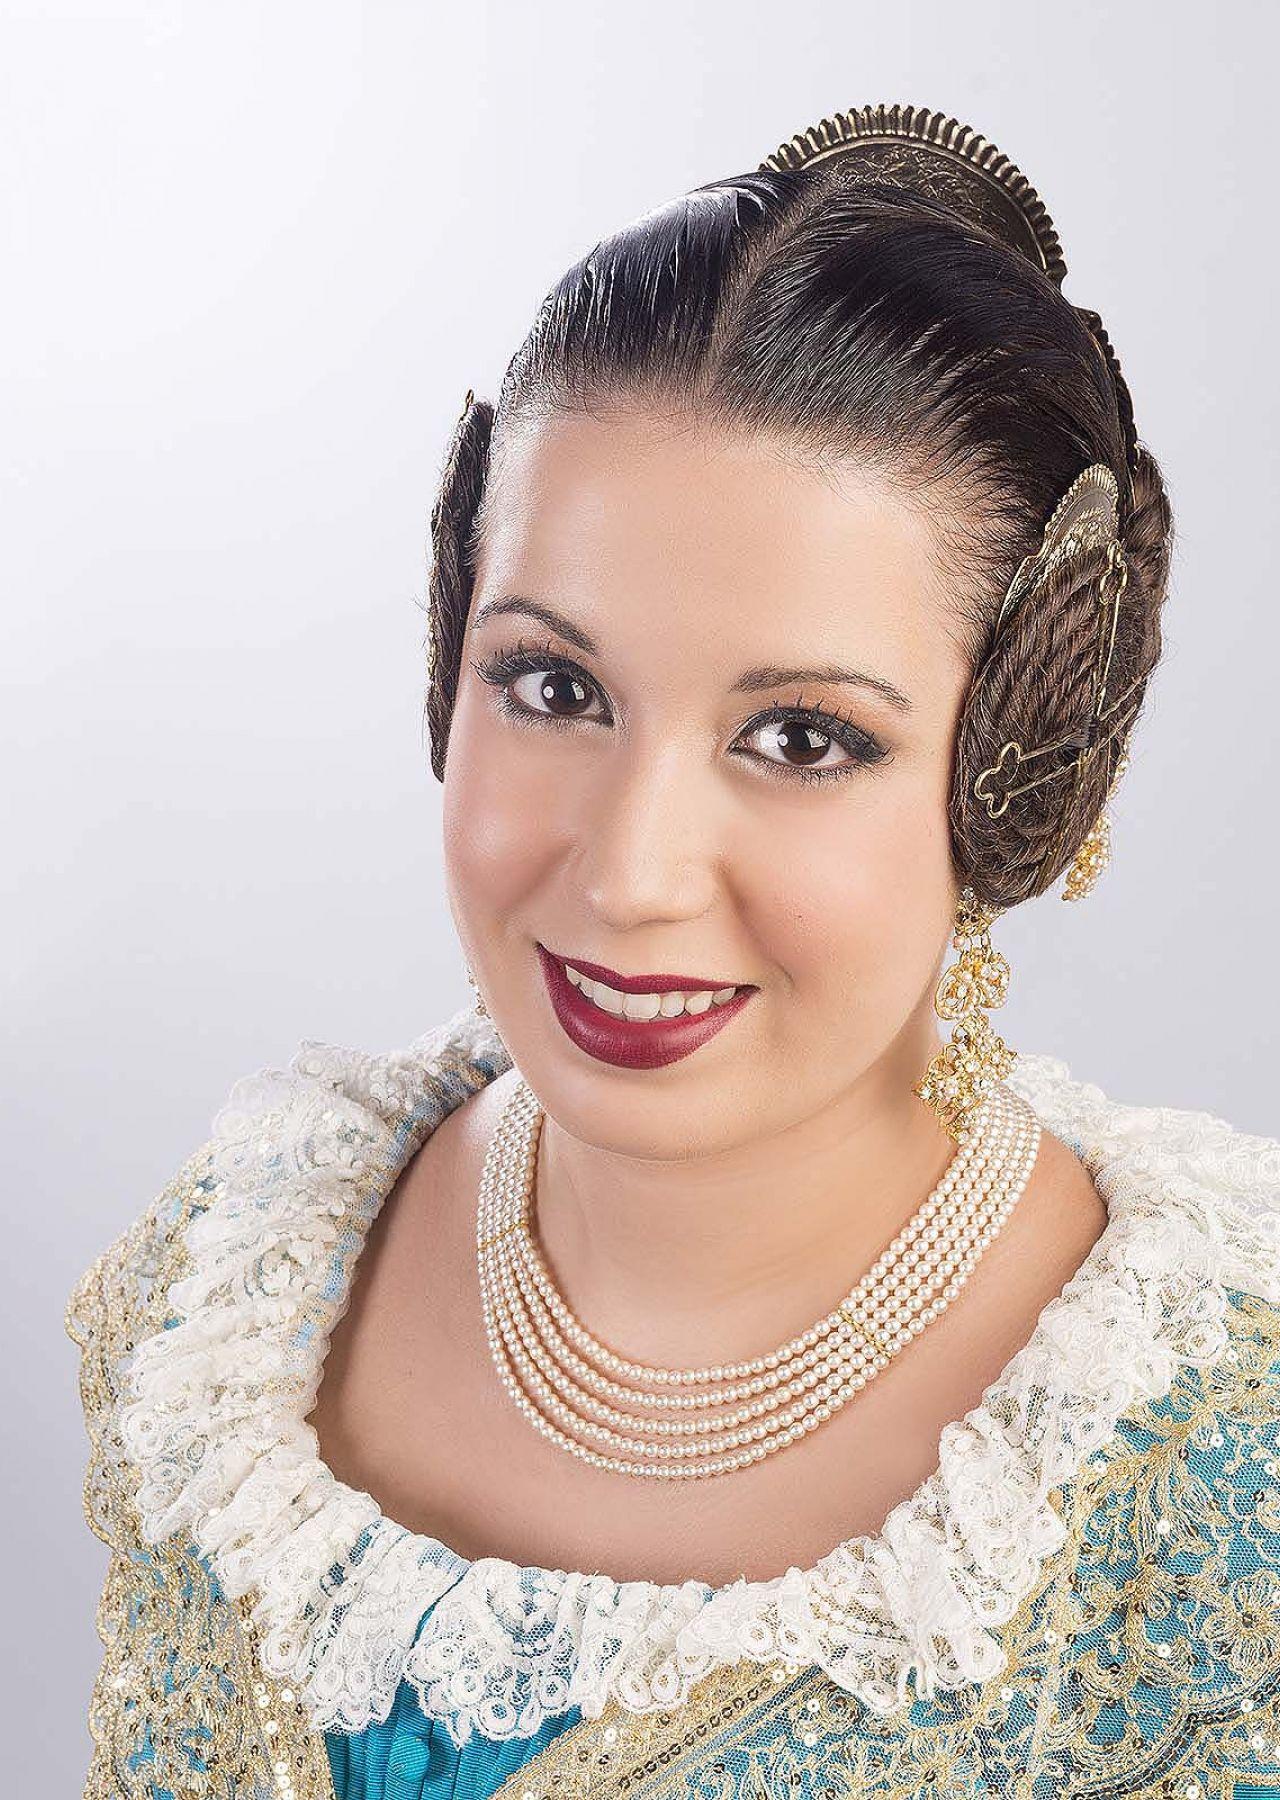 Marta Peiró Romero